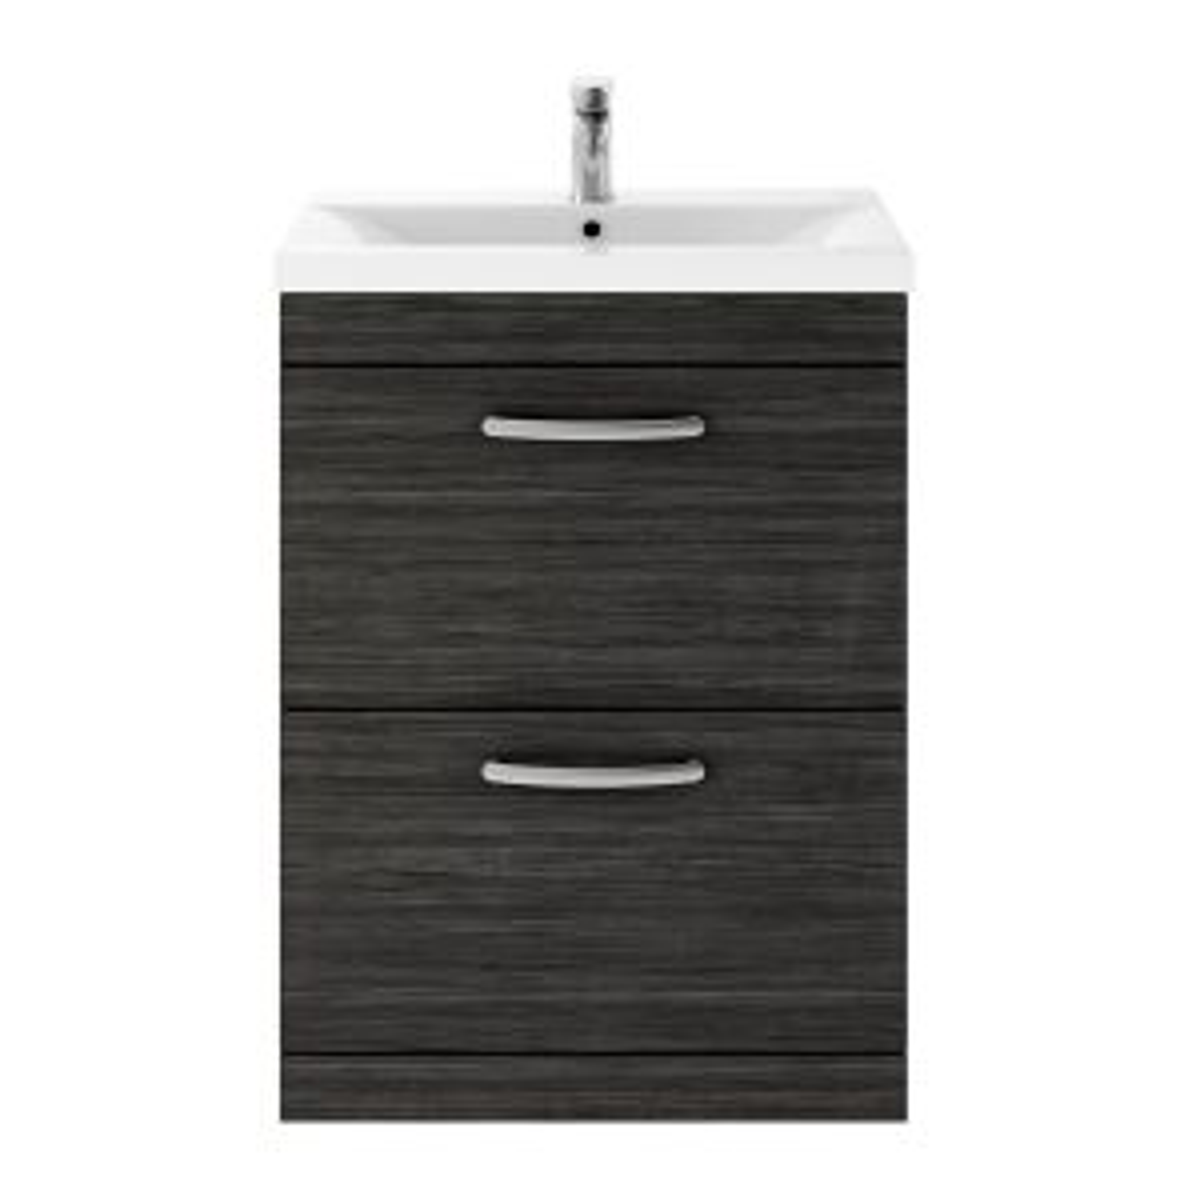 Nuie Athena Hacienda Black 2 Drawer Floor Standing Vanity Unit with 40mm Profile Basin 600mm